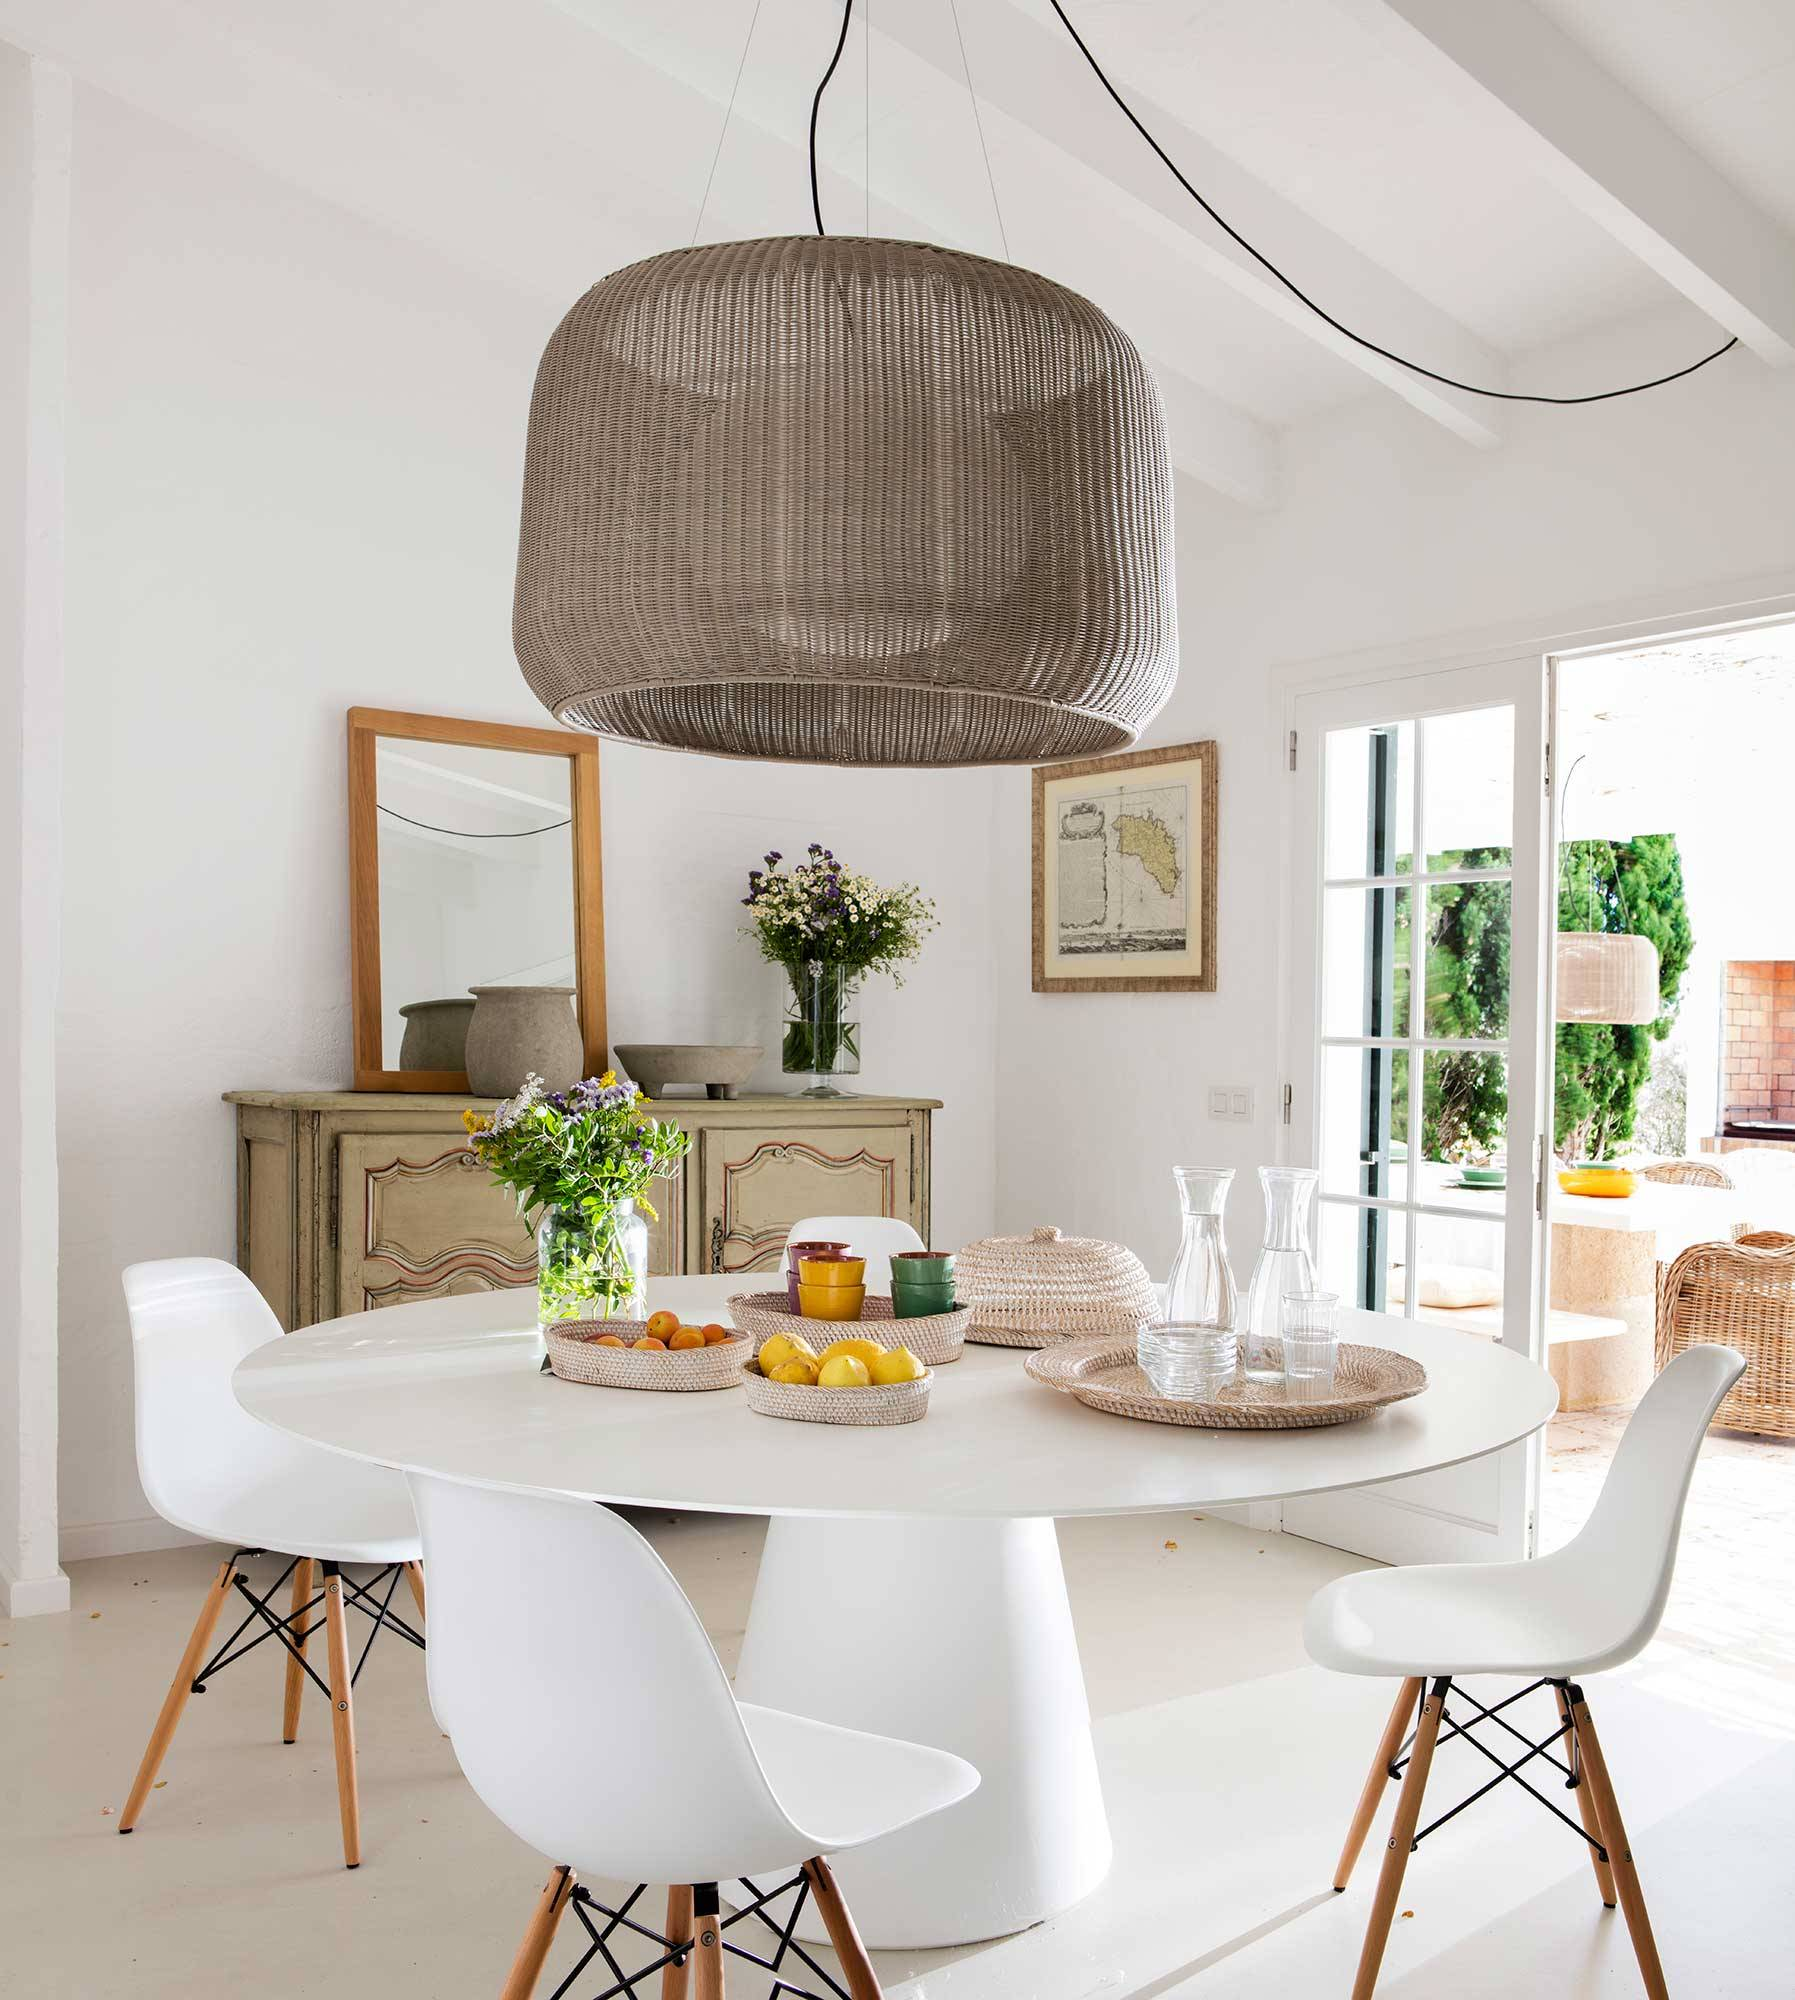 sillas para mesa de comedor blanca